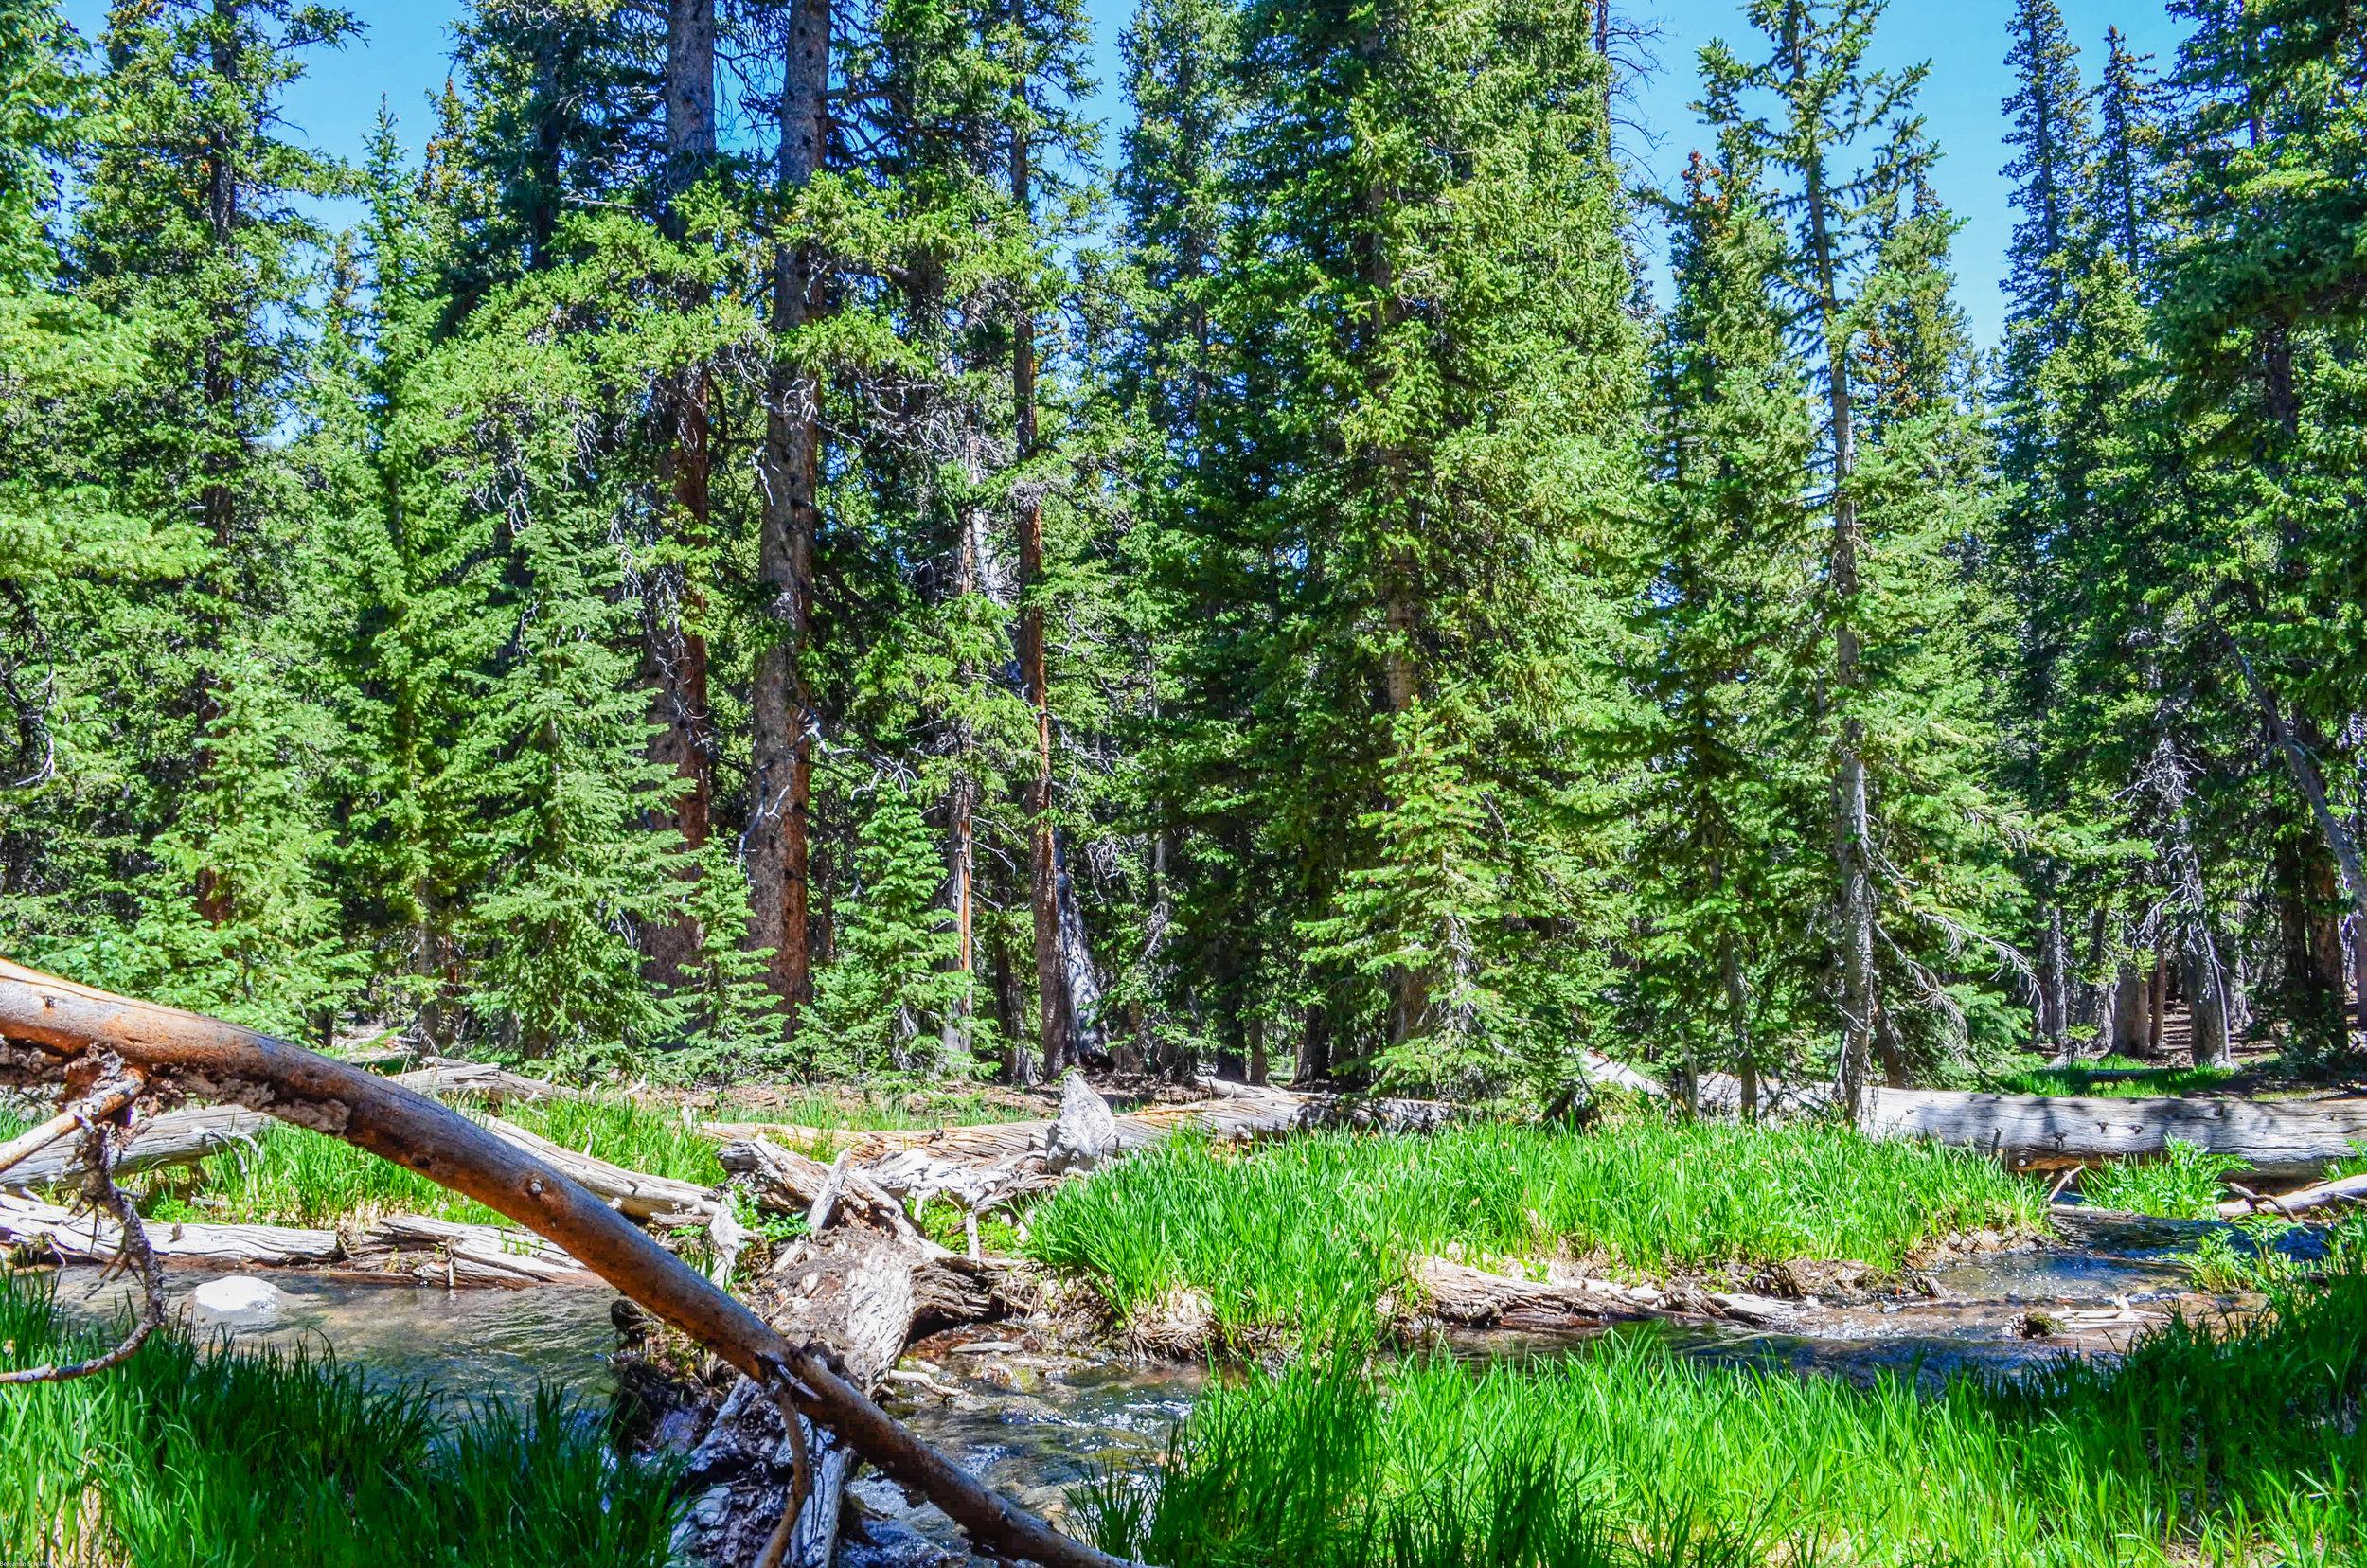 Part of the high alpine conifer forest off Wheeler Peak Summit Trail